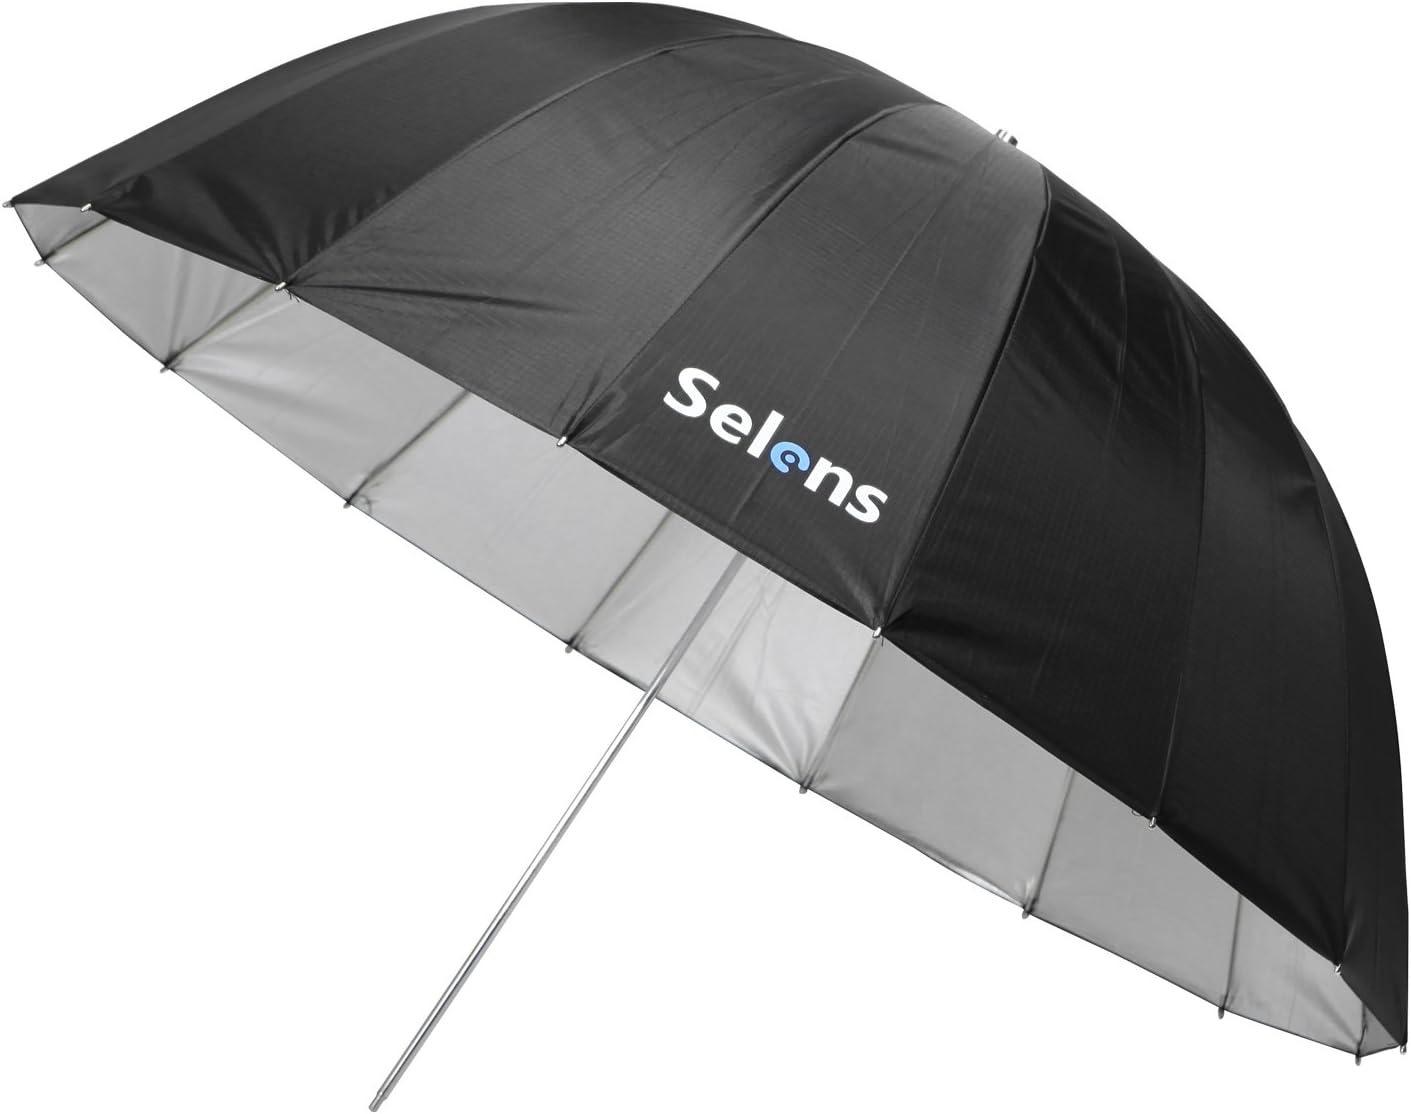 Selens 65 Inch 16 Rods Professional Photography Photo Studio Parabolic Reflective Lighting Umbrella, 23 Inch Depth Black/Silver